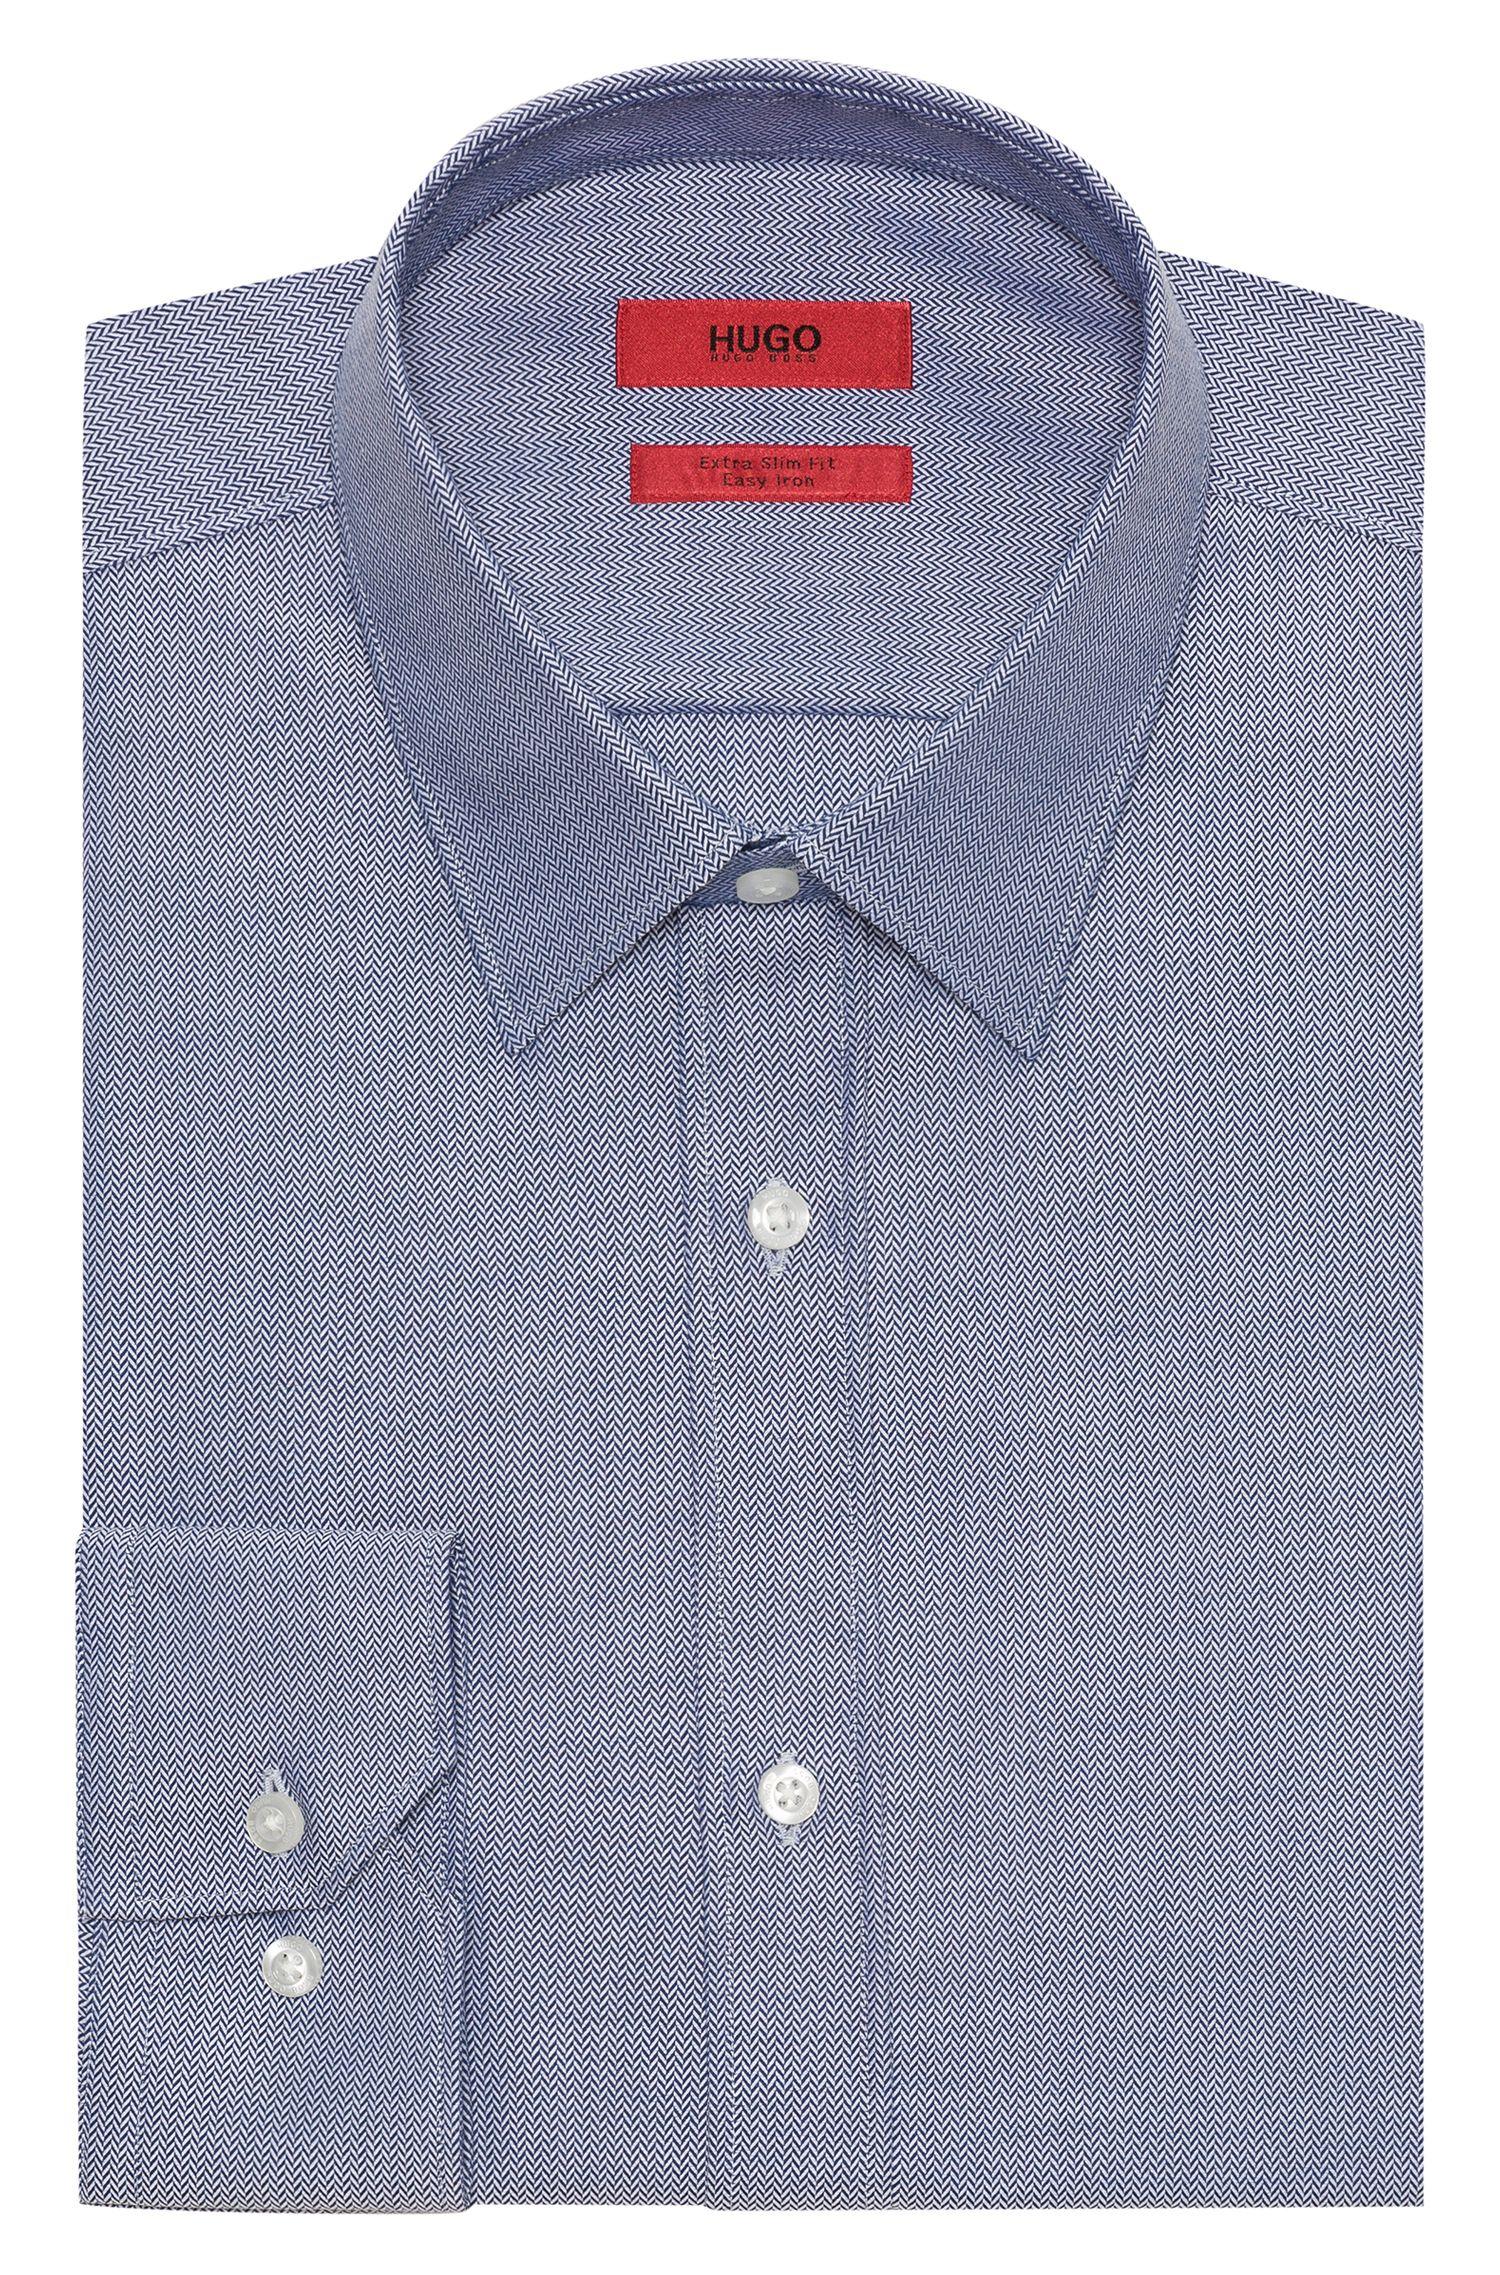 Herringbone Dress Shirt, Extra Slim Fit | Elisha, Dark Blue